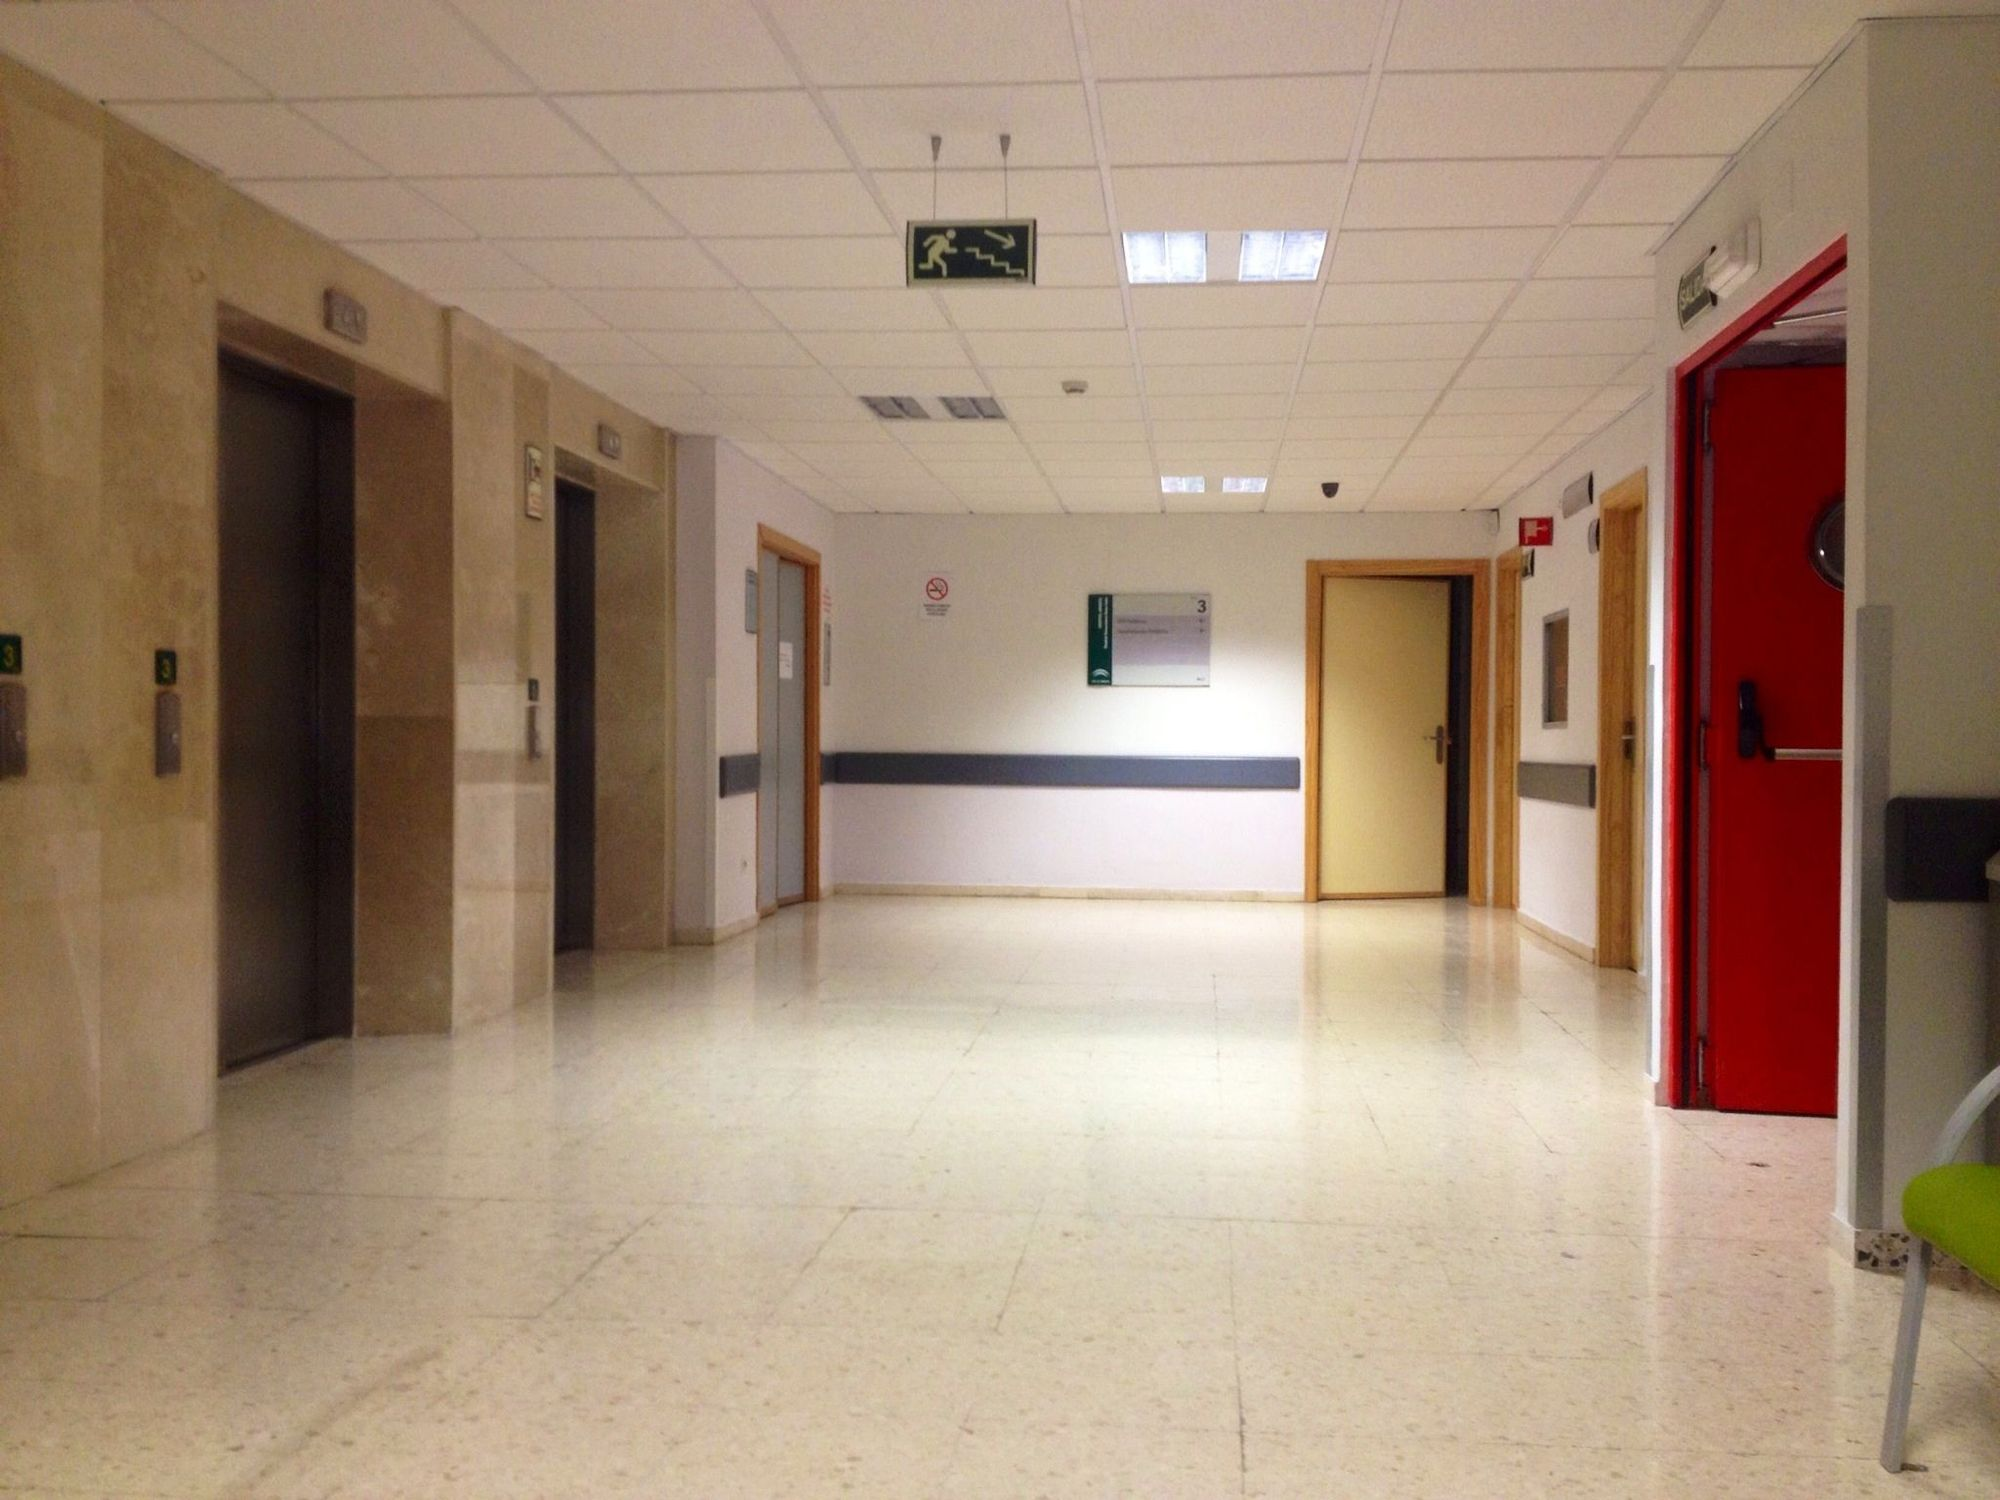 Sala De Estar Hospital ~  de monitores y paritorios Sala de espera (vacía) anexa a sala de